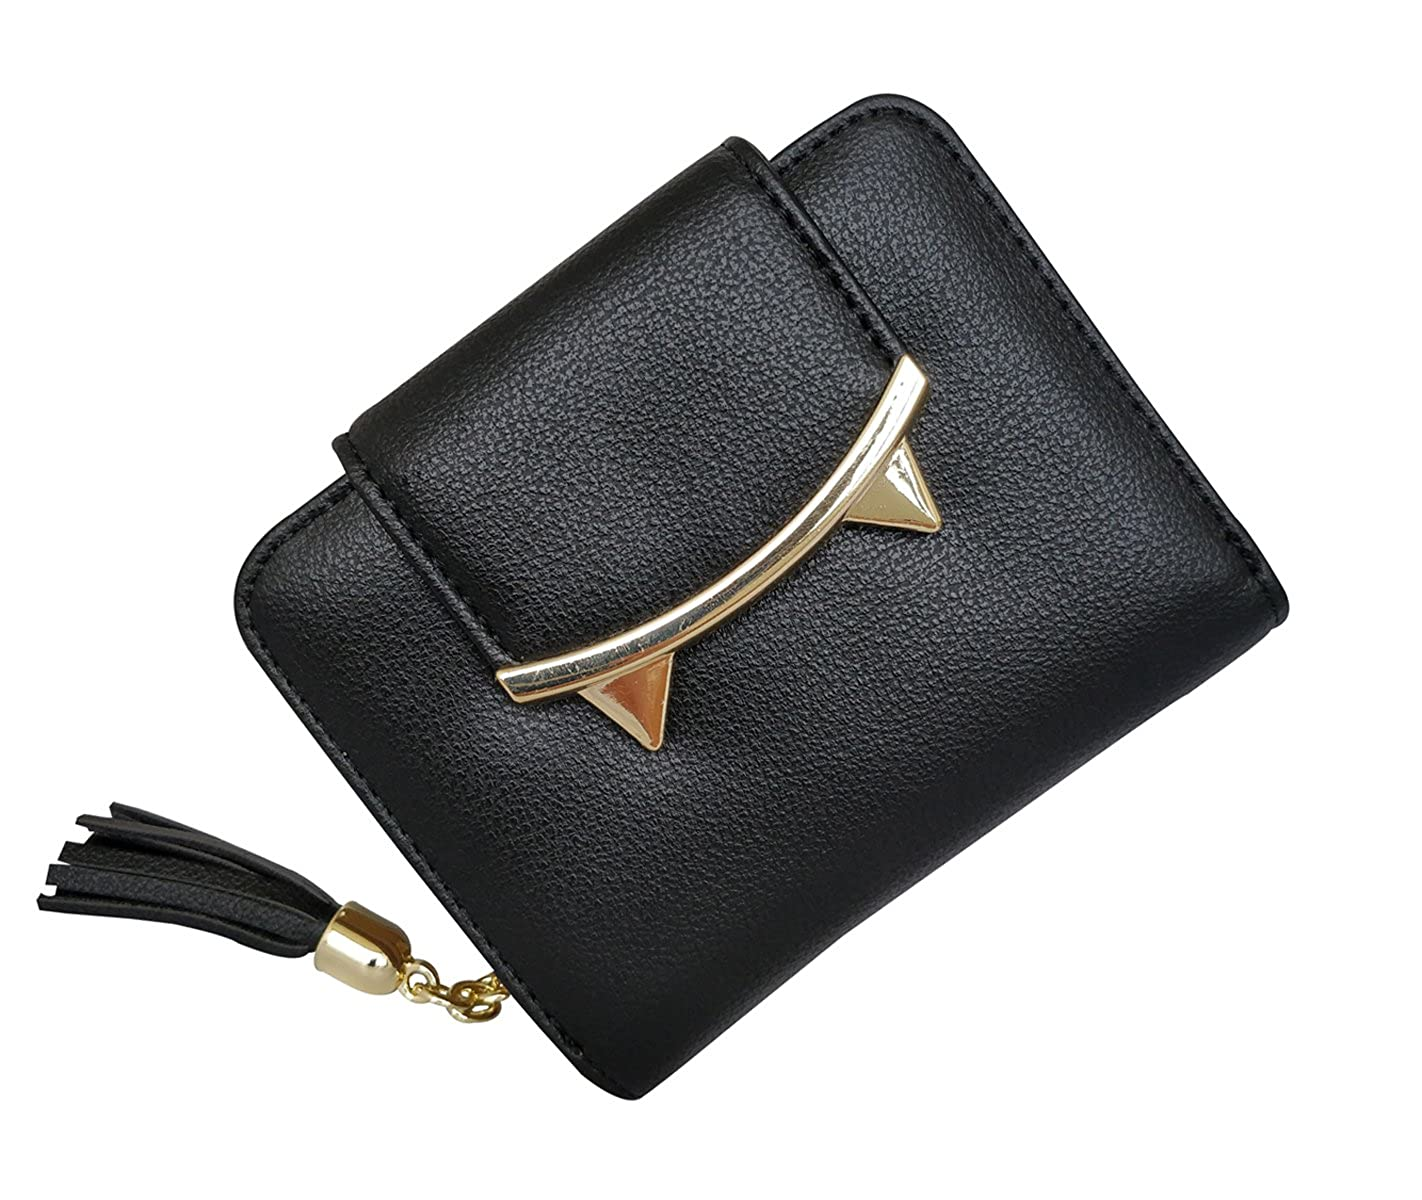 f4da82707 Amazon.com: HeySun Adorable Cat Ears Coin Purse for Ladies Small Wallet  Money Clip Designer Card Case (Black): Shoes